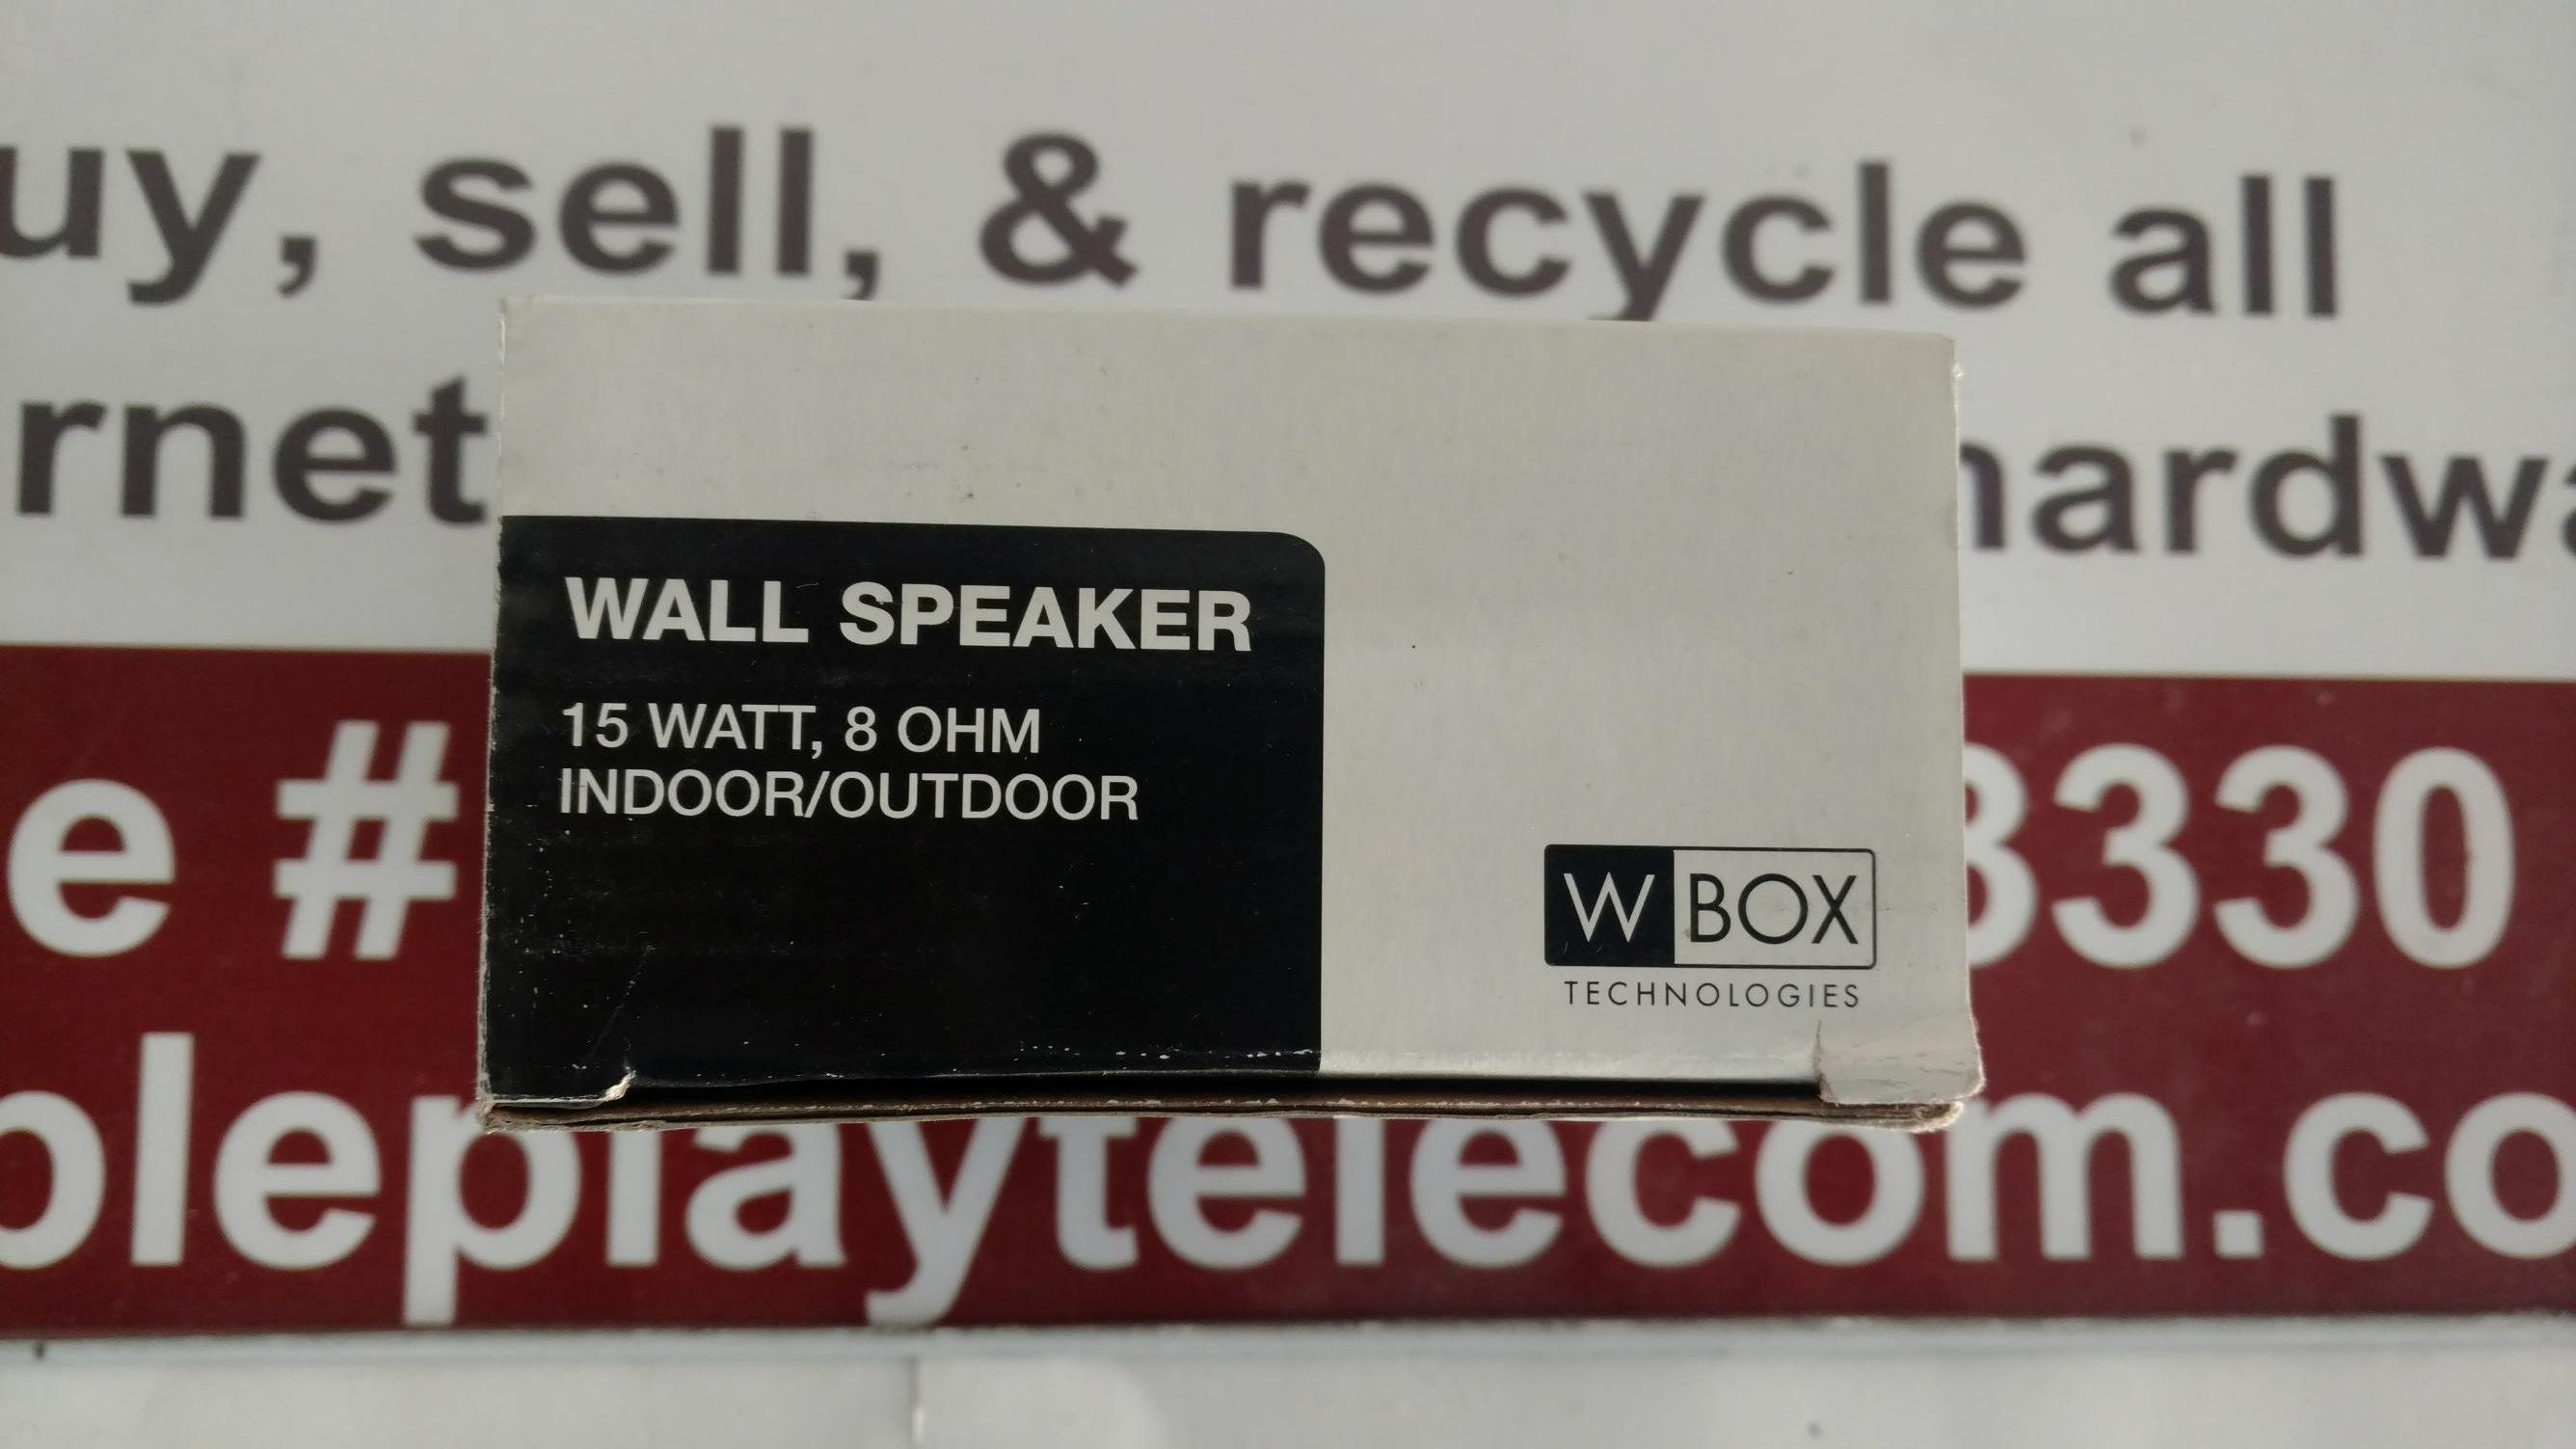 Details about Wbox Technologies 0E-WALLSPEKR Indoor/Outdoor Wall Speaker